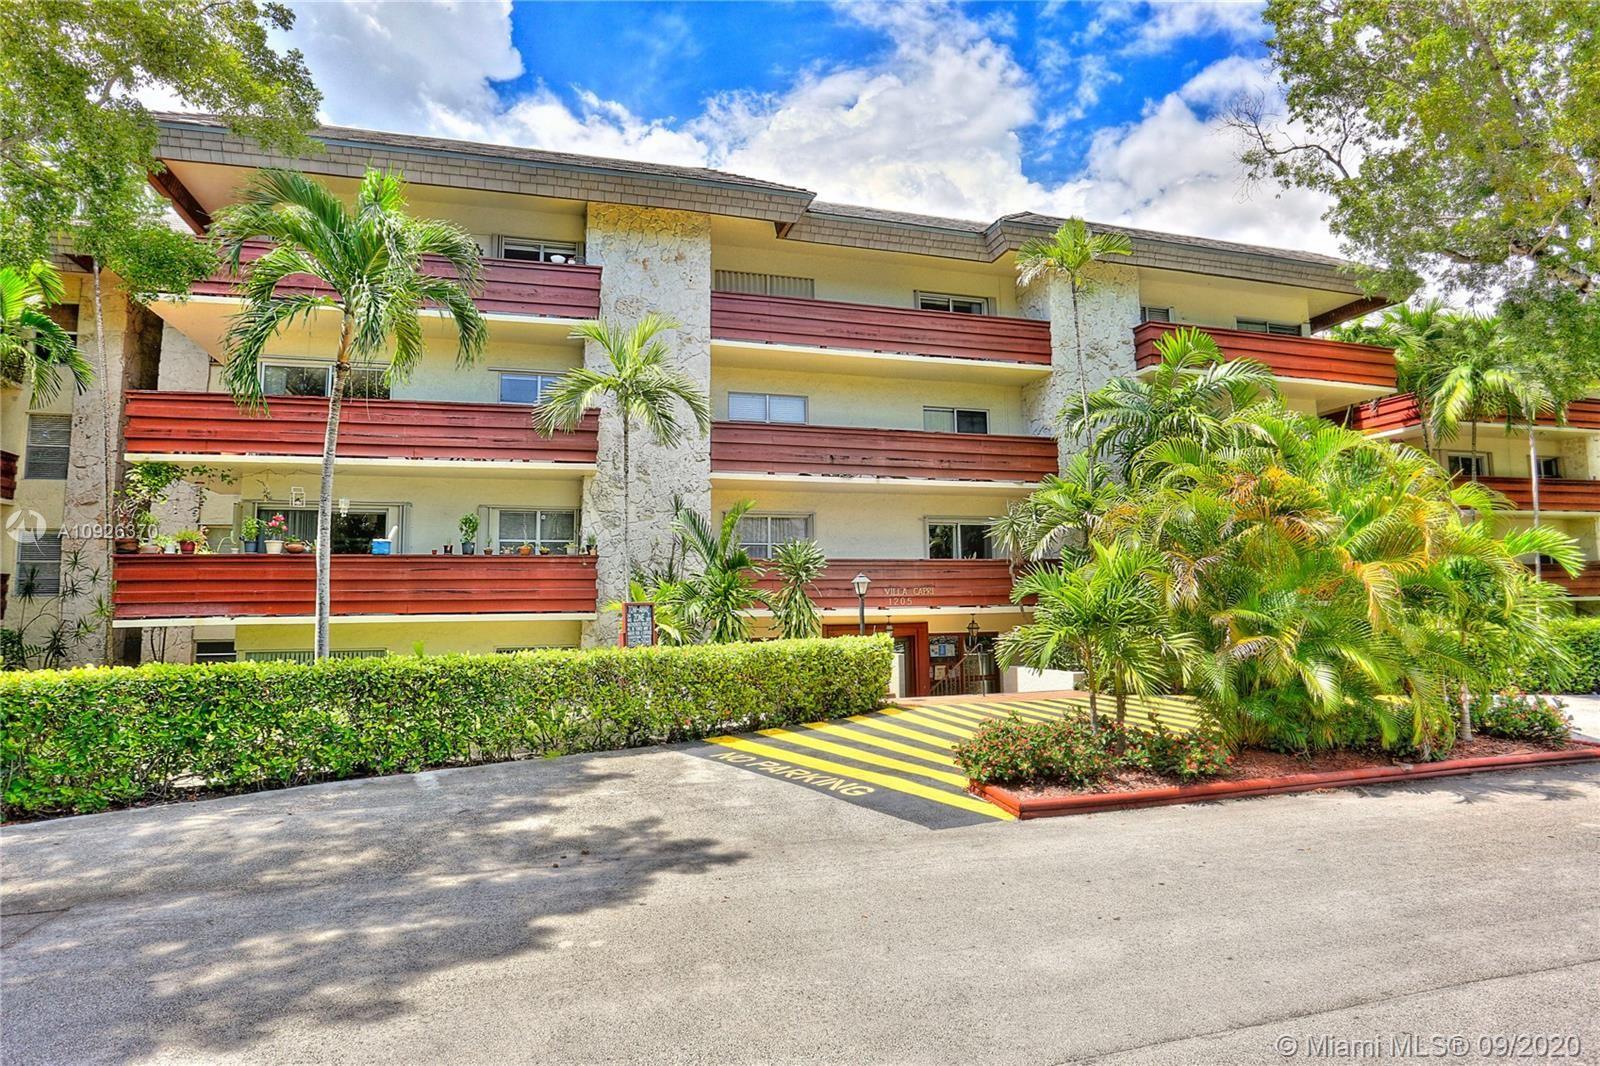 1205 Mariposa Ave #321, Coral Gables, FL 33146 - #: A10926370